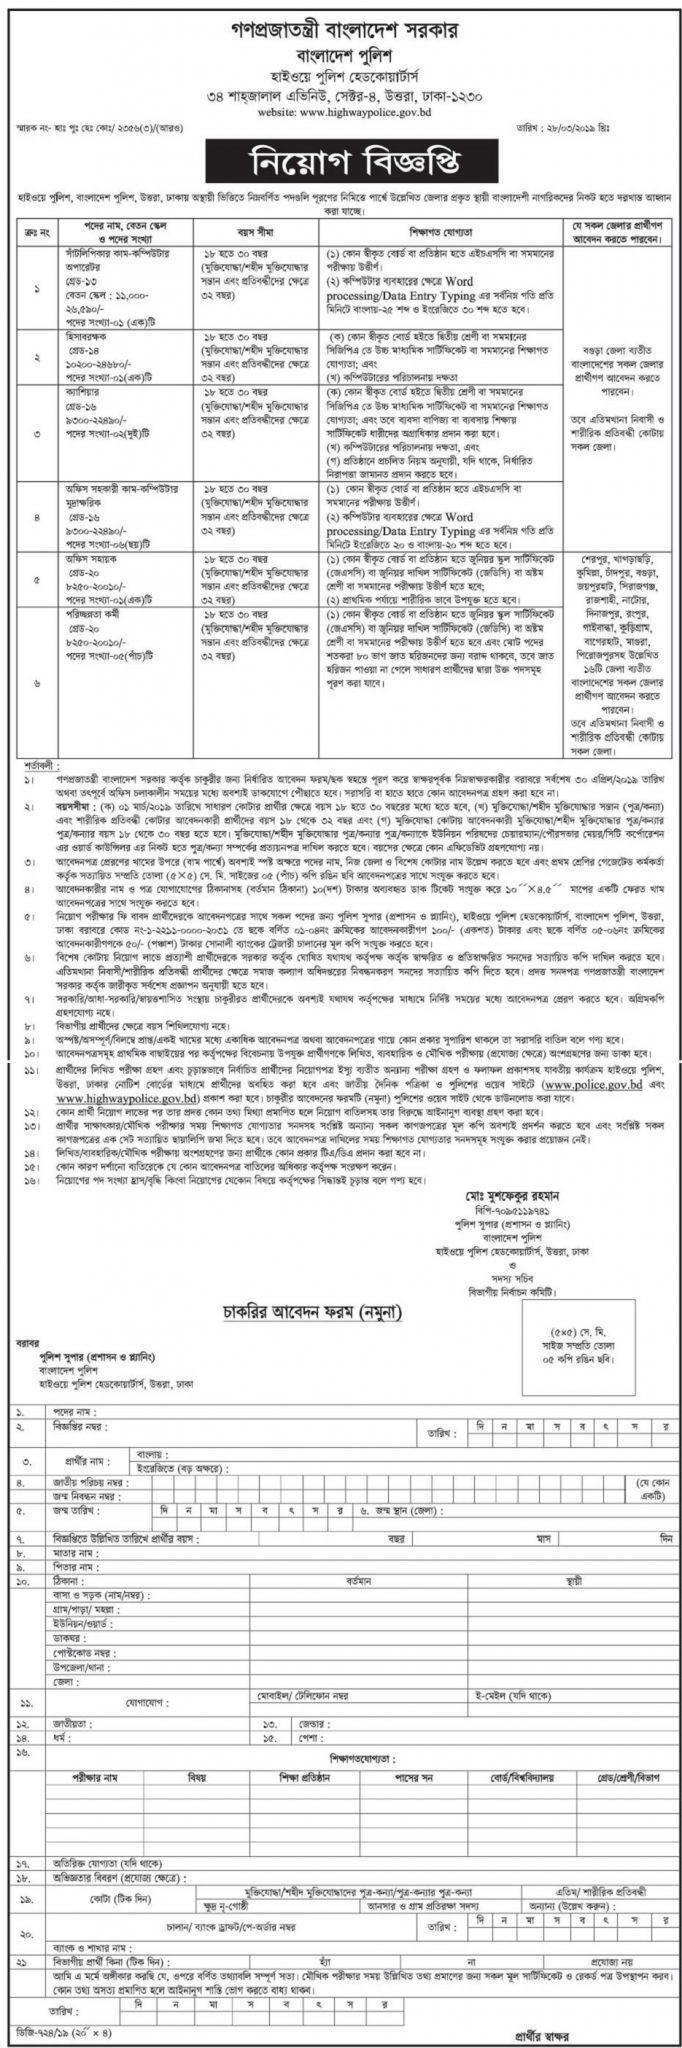 Bangladesh Highway Police Job Circular 2019 BD Jobs